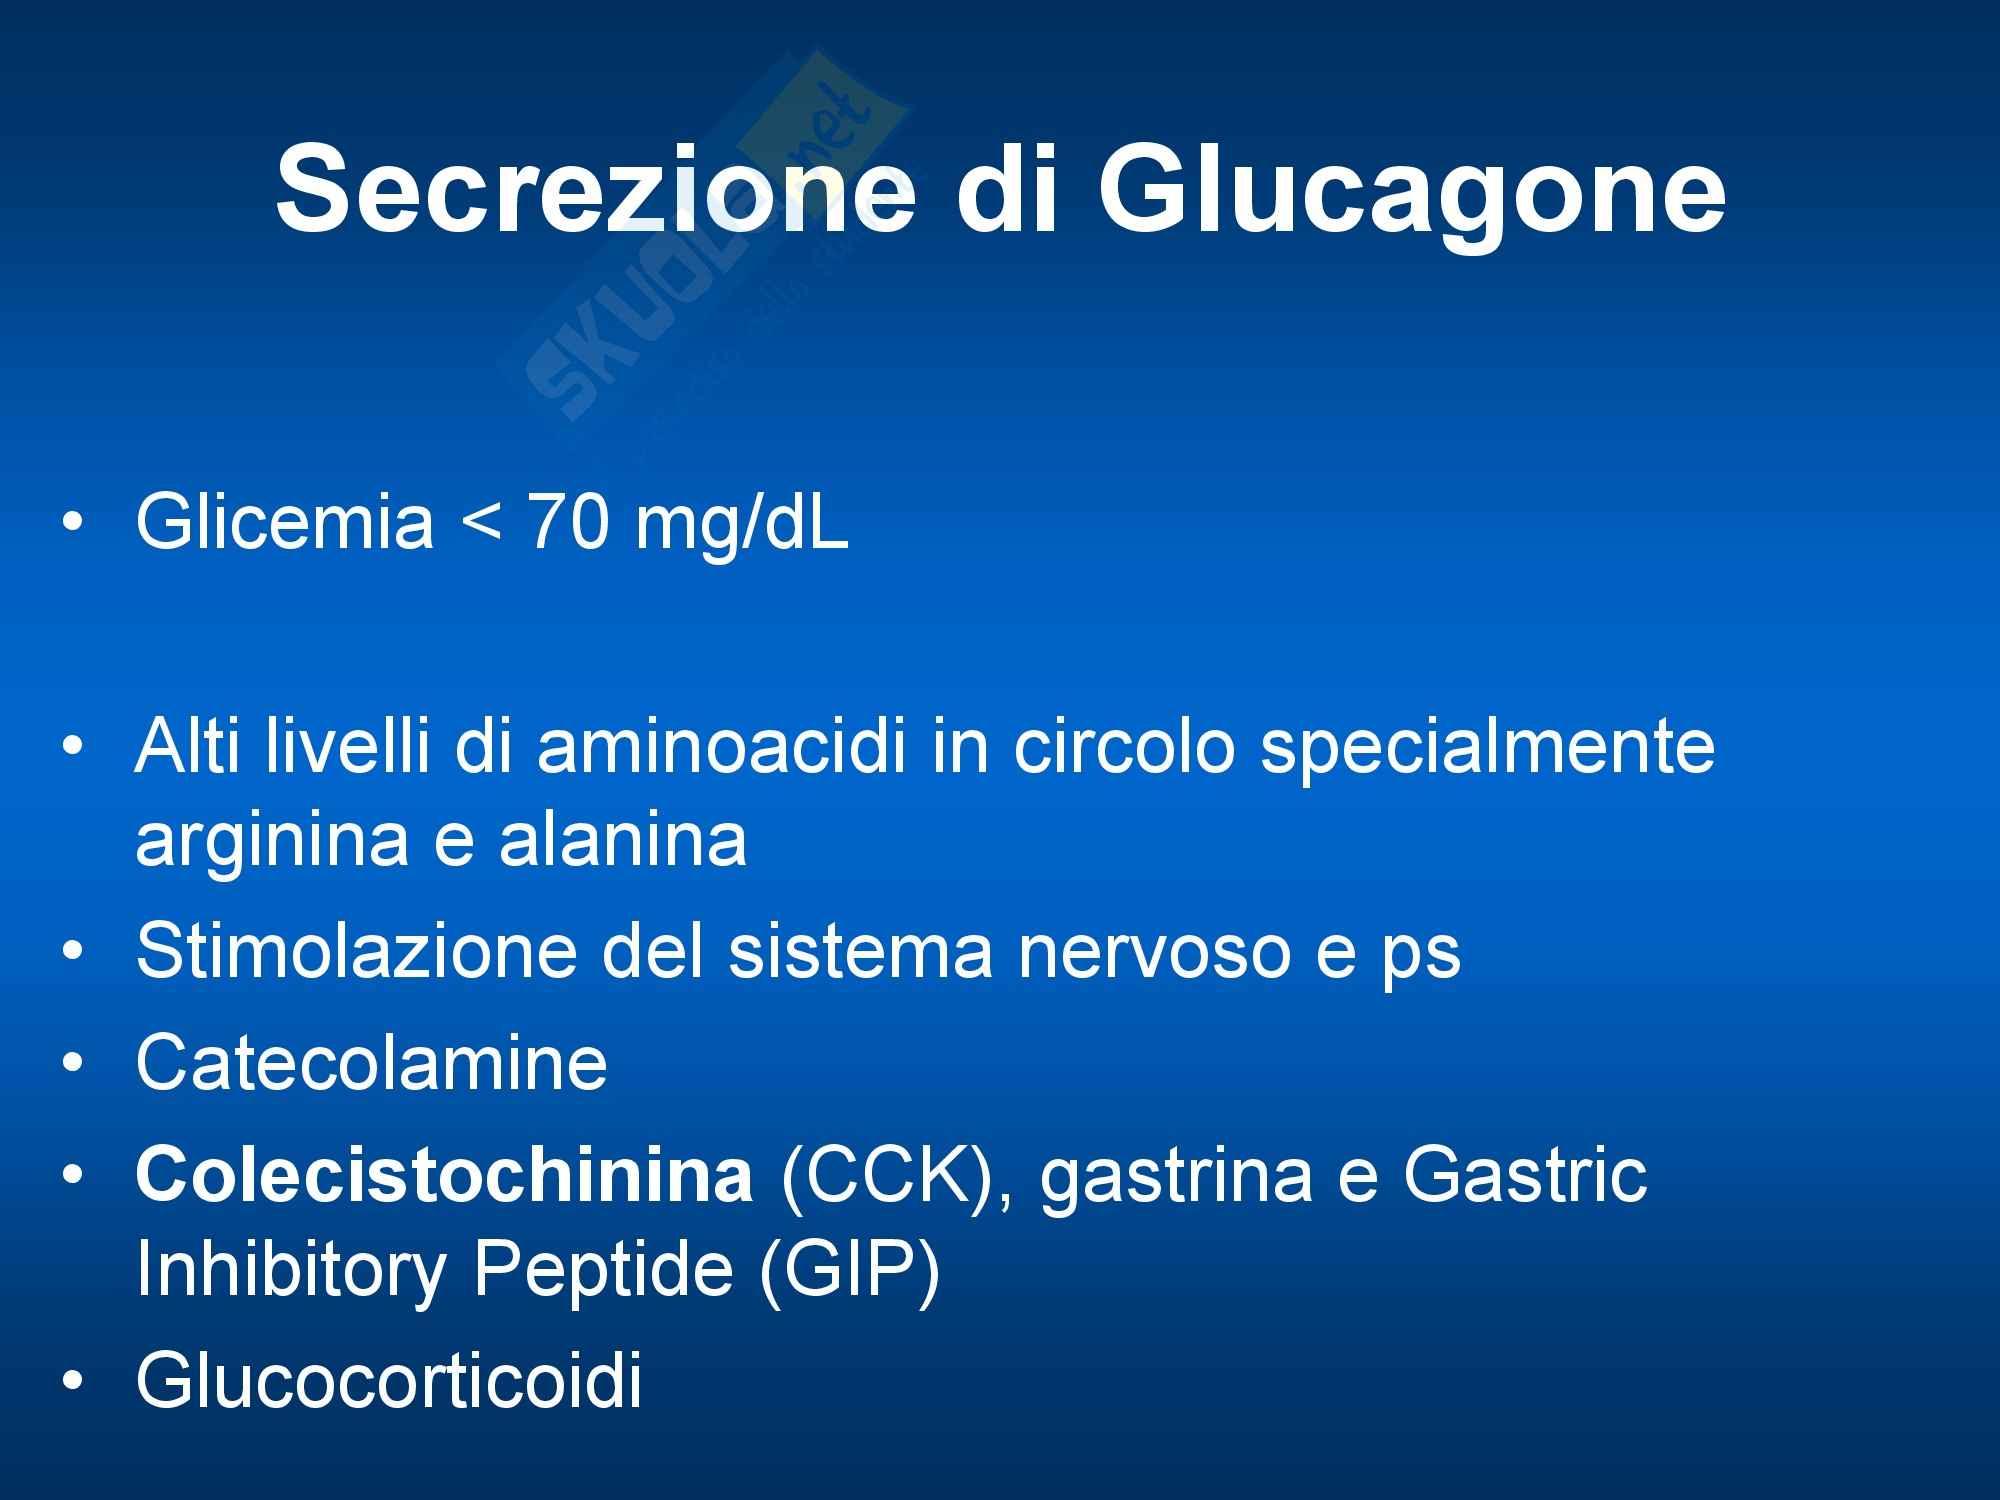 Endocrinologia - Glucagone Pag. 2